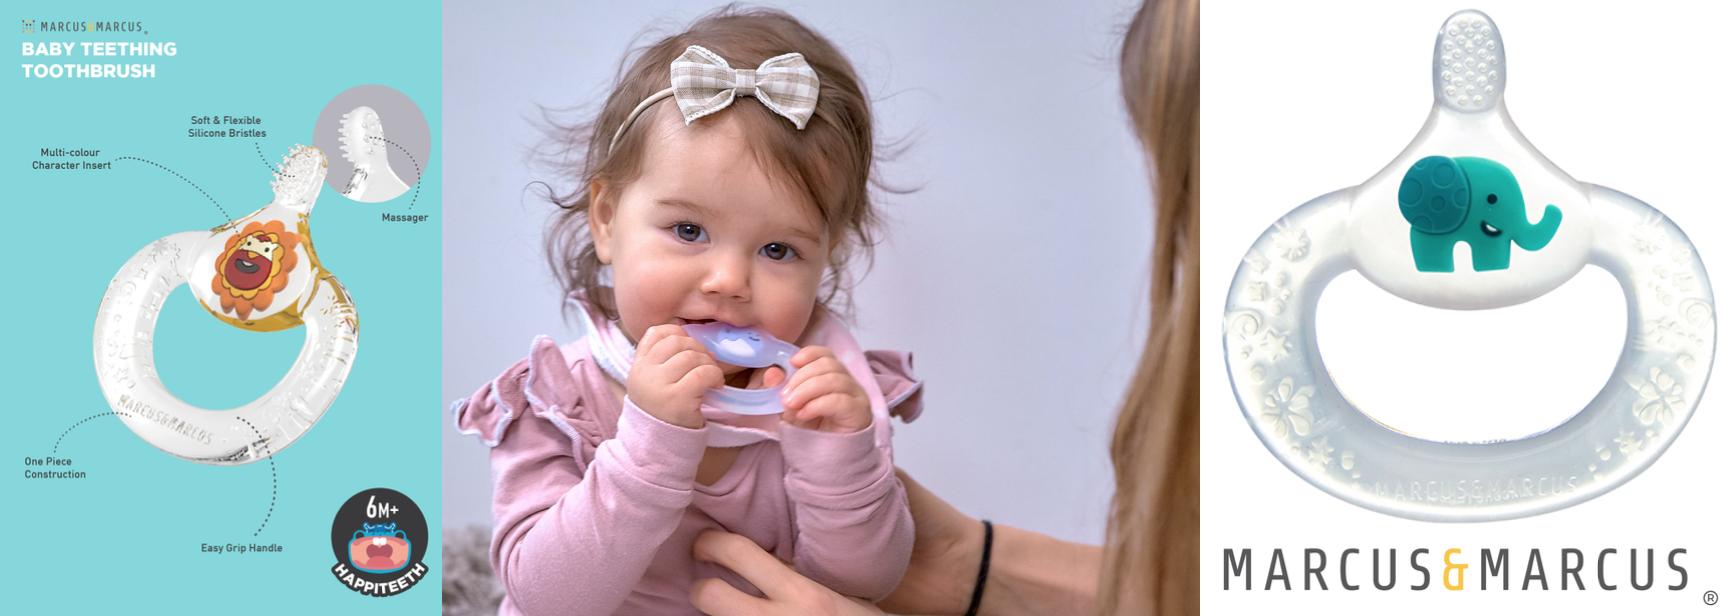 Baby teething toothbrush slider